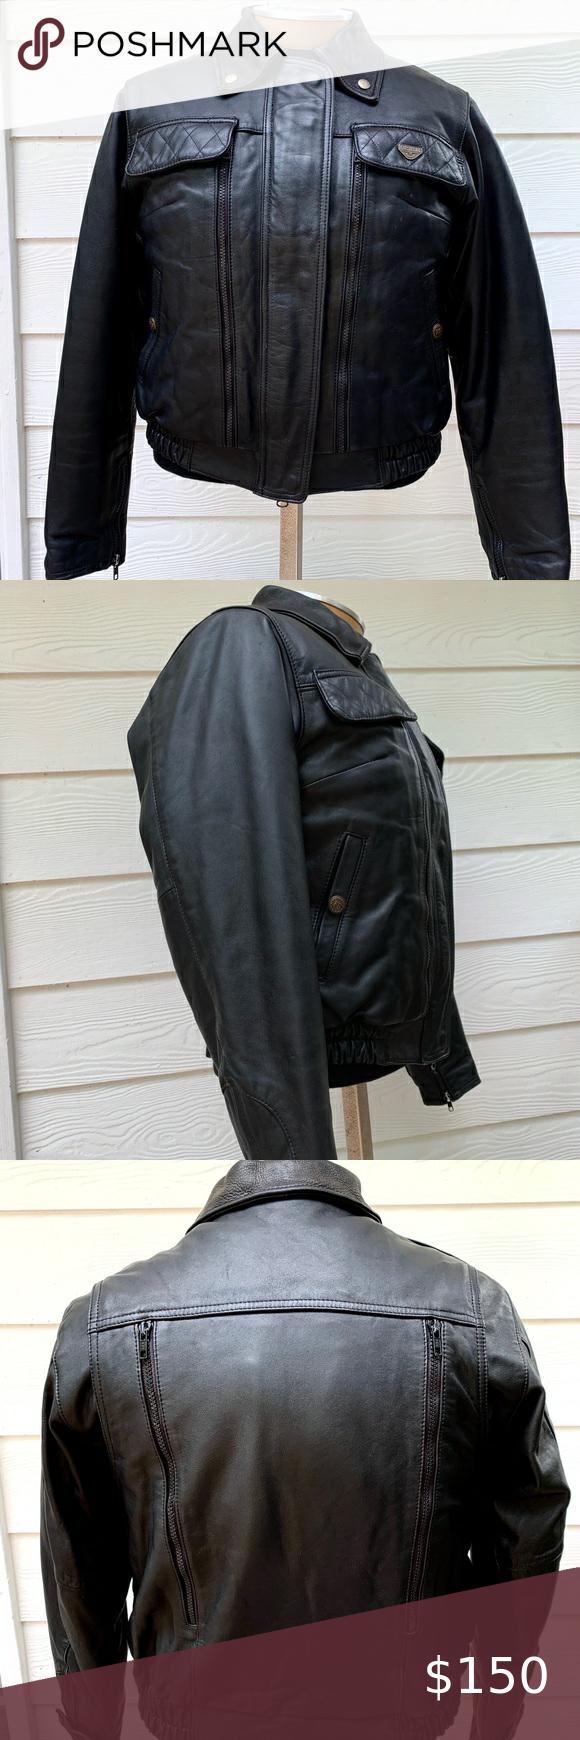 Vintage Firstgear leather jacket by Hein Gericke® in 2020